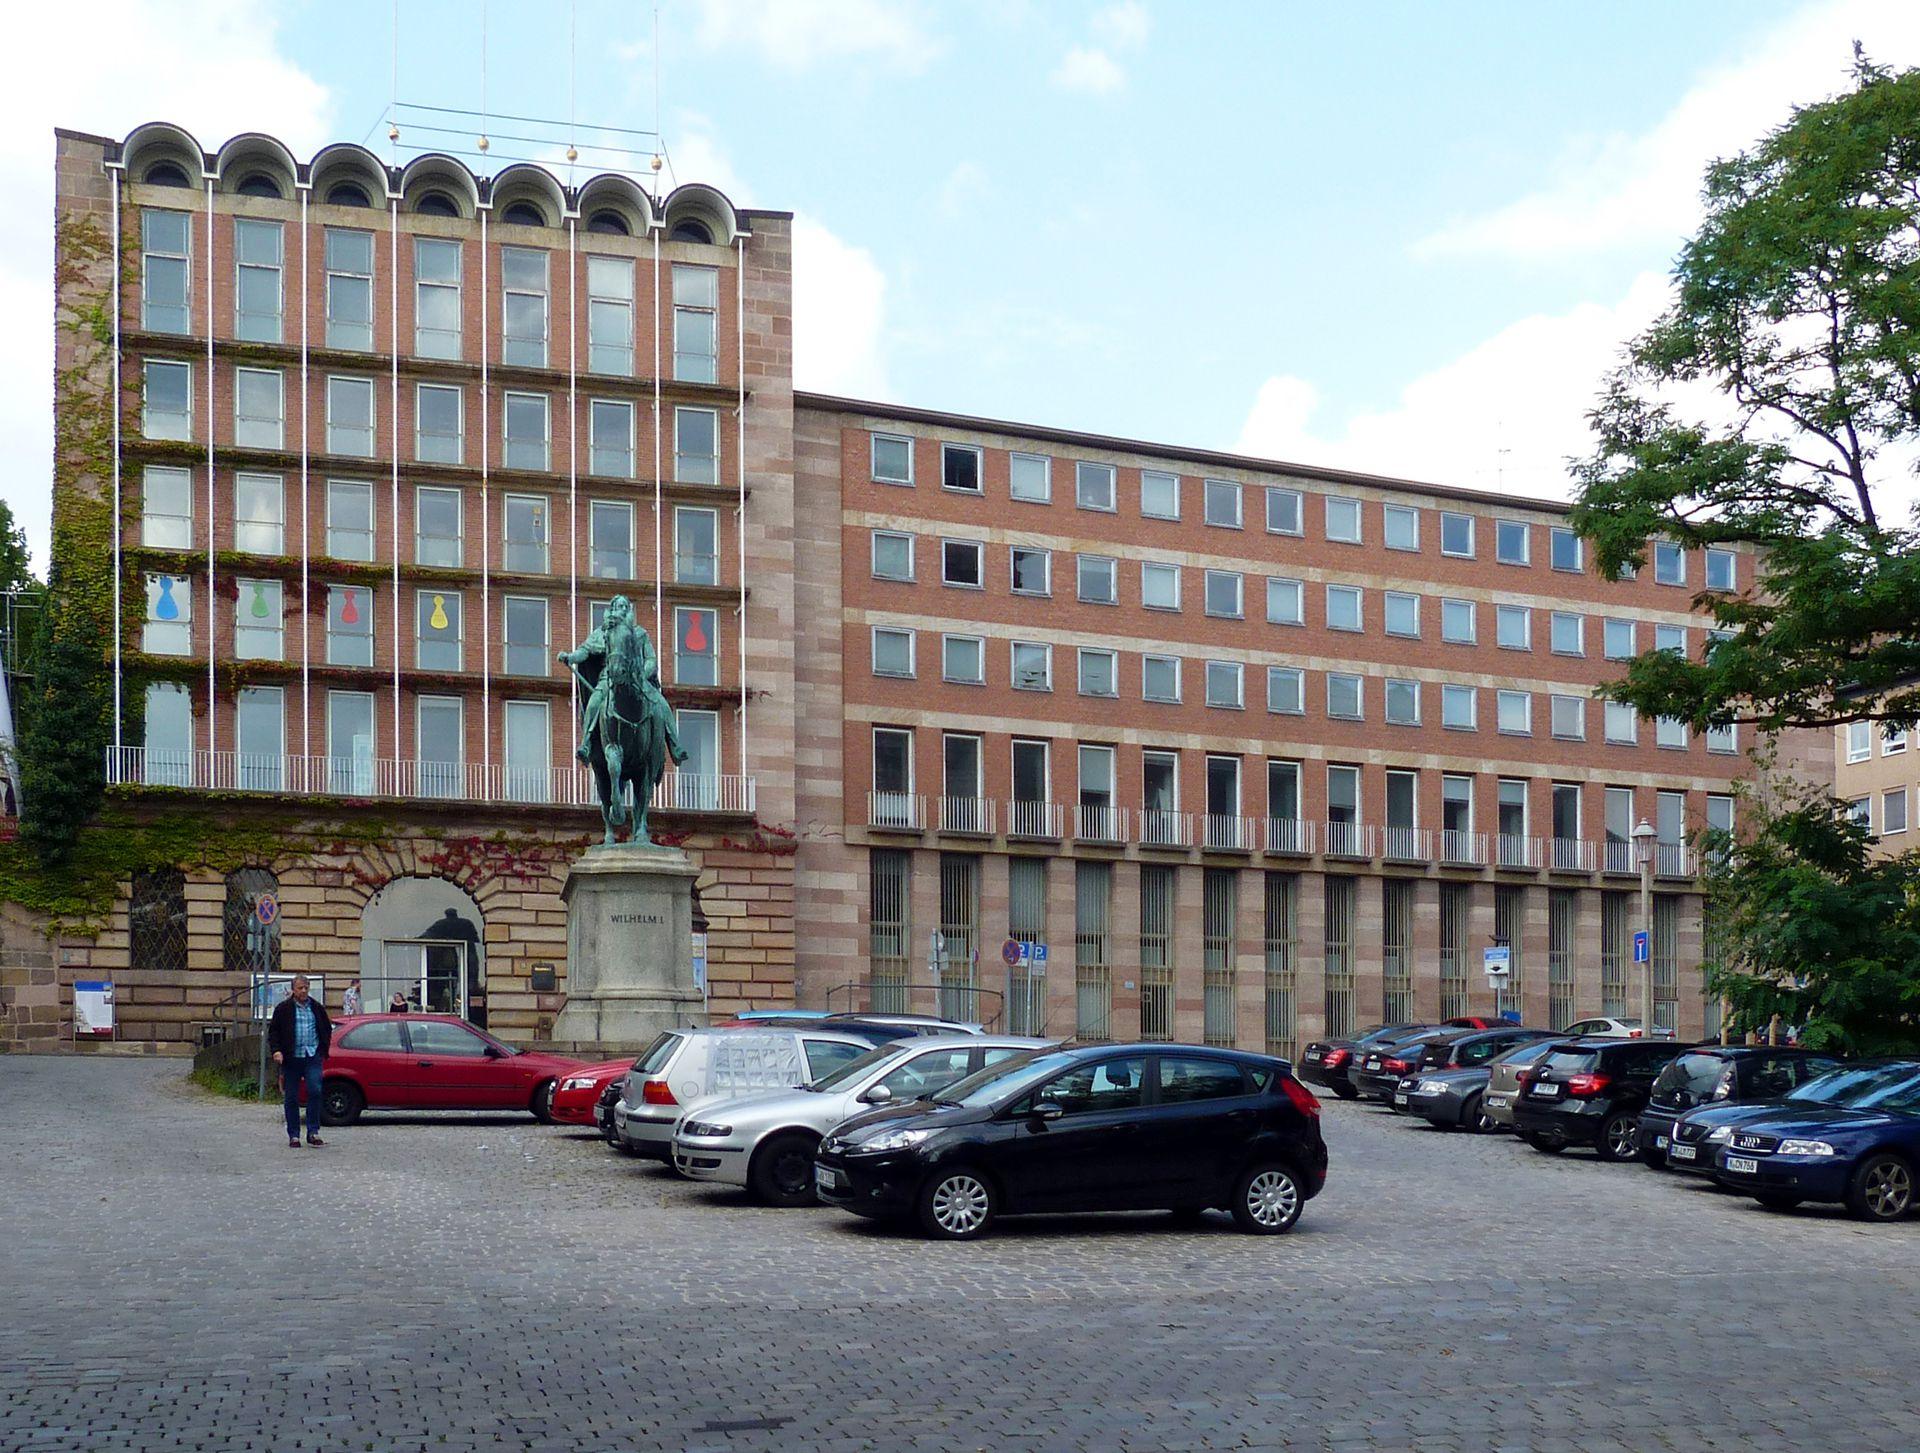 ehem. Stadtbibliothek / ehem. Pellerhaus Gesamtansicht